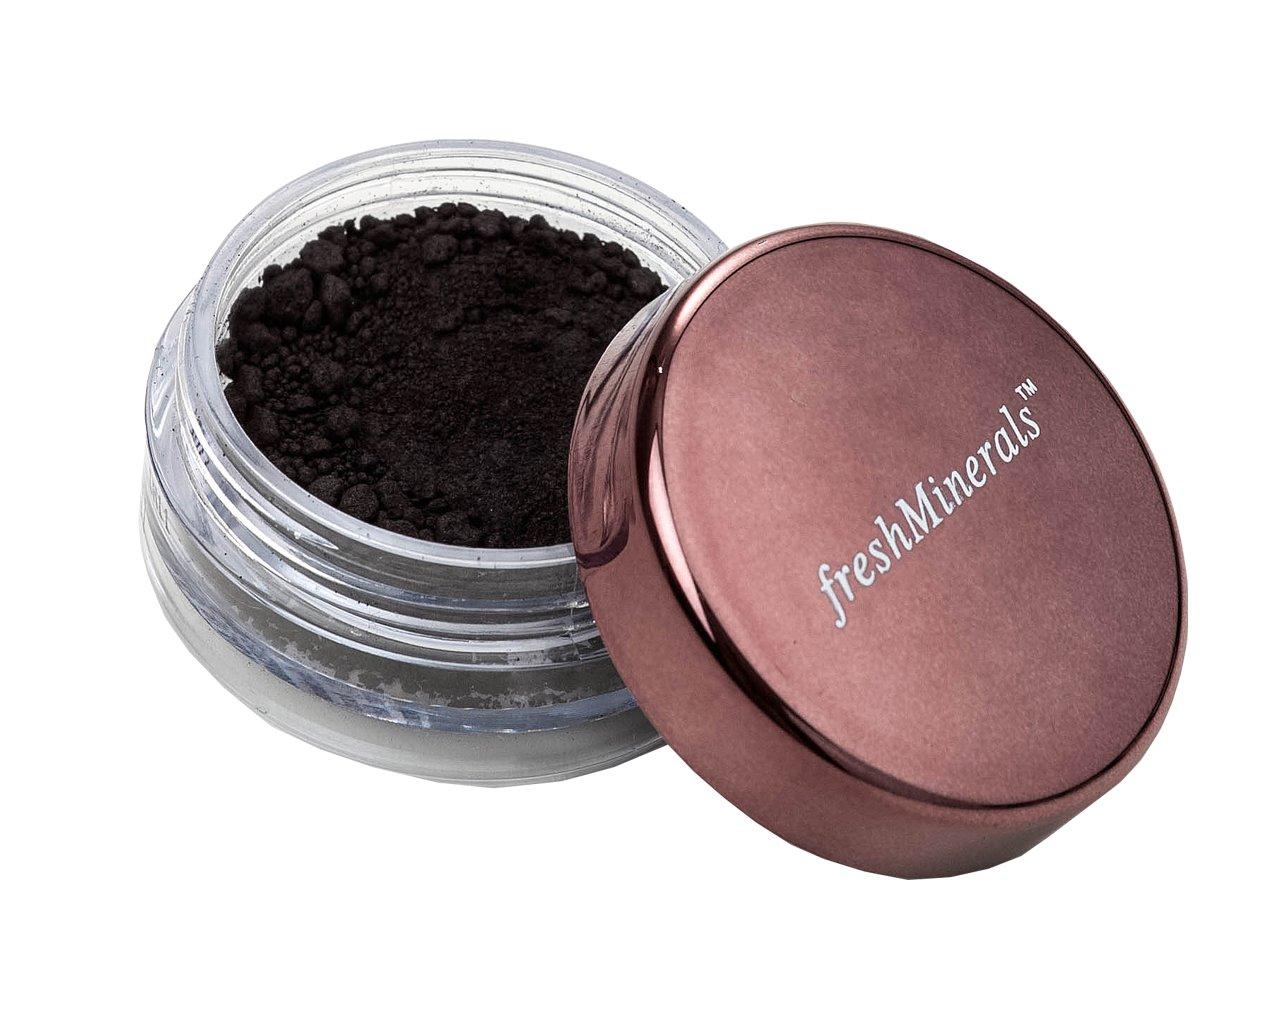 FreshMinerals Loose Eyeshadow, Matt Black, 1.5 Gram